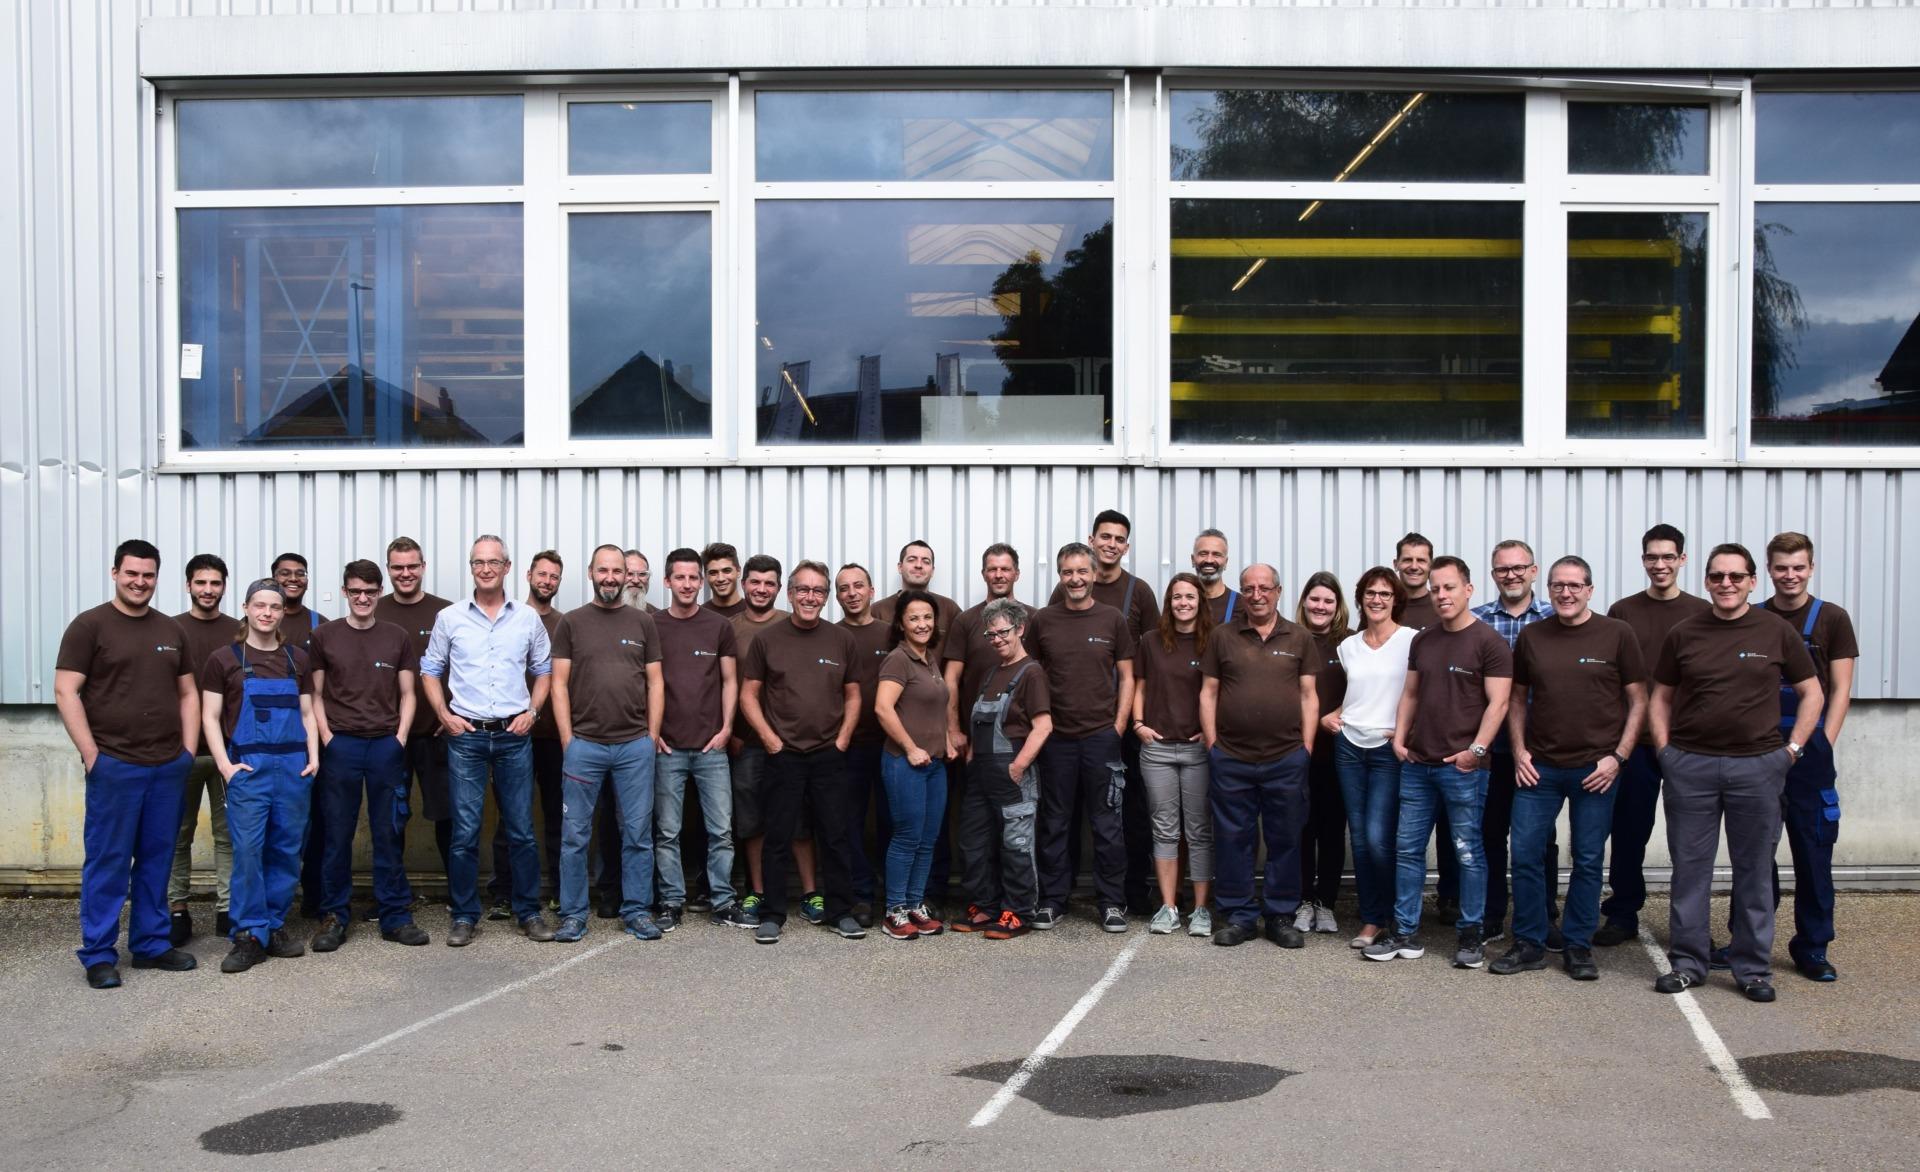 Team Rupp Metalltrend: Metallbau, Metallbauer, Metalltreppen, Maschinenbau, Blechbearbeitung, Laserschneiden, Caroports, Geländer, Schlosserei, Terrassen Überdachung